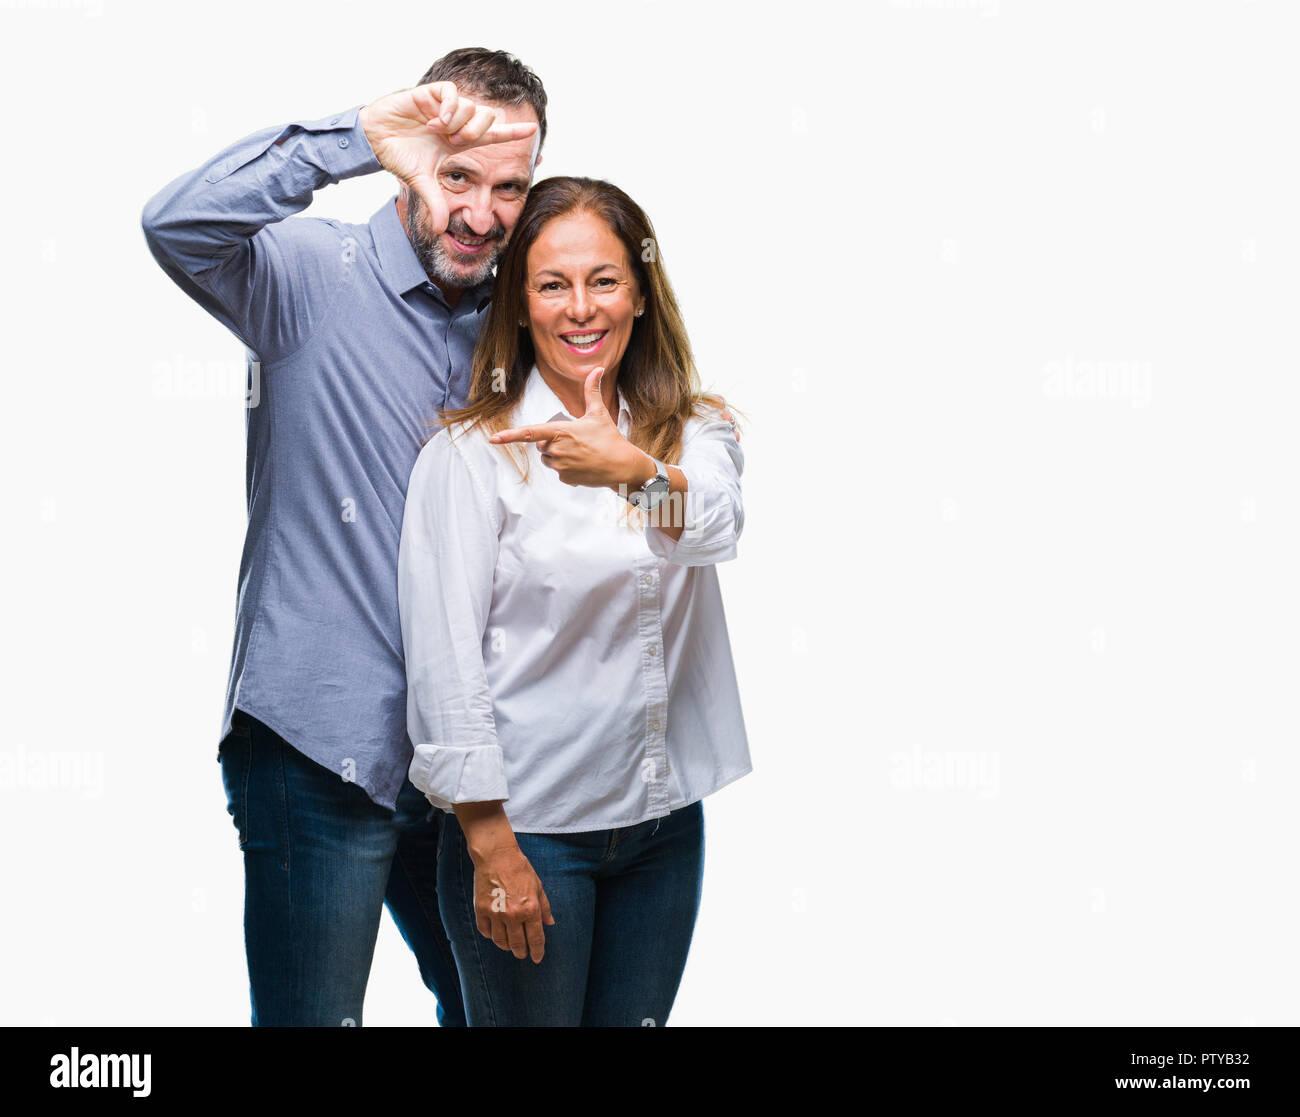 Middle age hispanic business couple over isolated background smiling ...